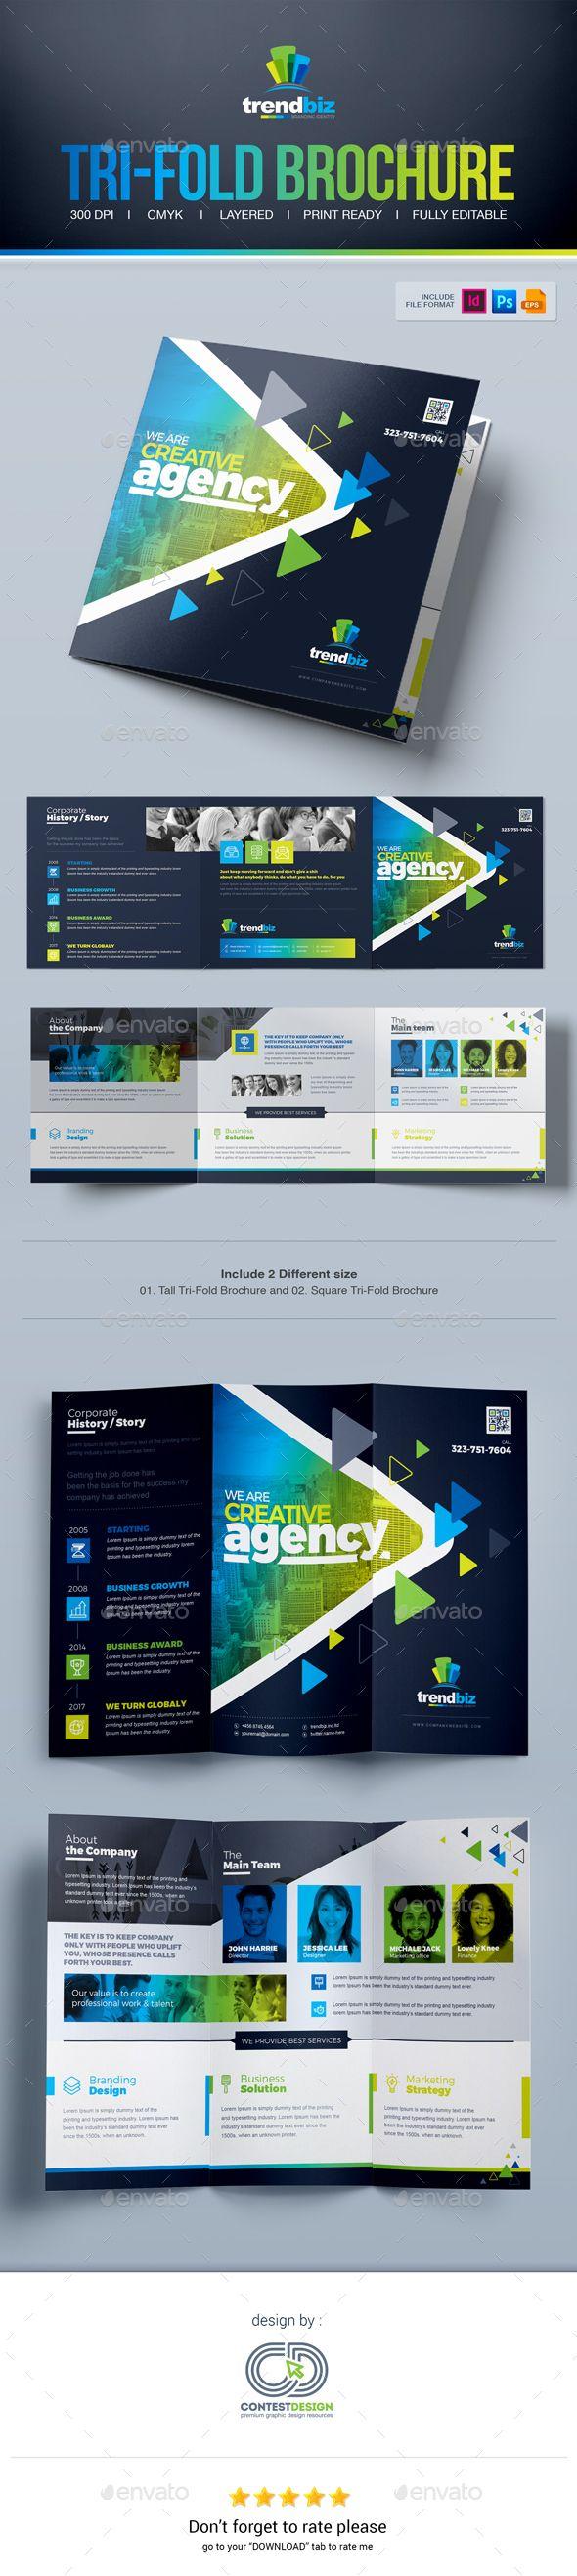 Tri Fold Brochure Template / Square Tri-Fold Brochure Design - PSD, Vector EPS, InDesign INDD, AI Illustrator